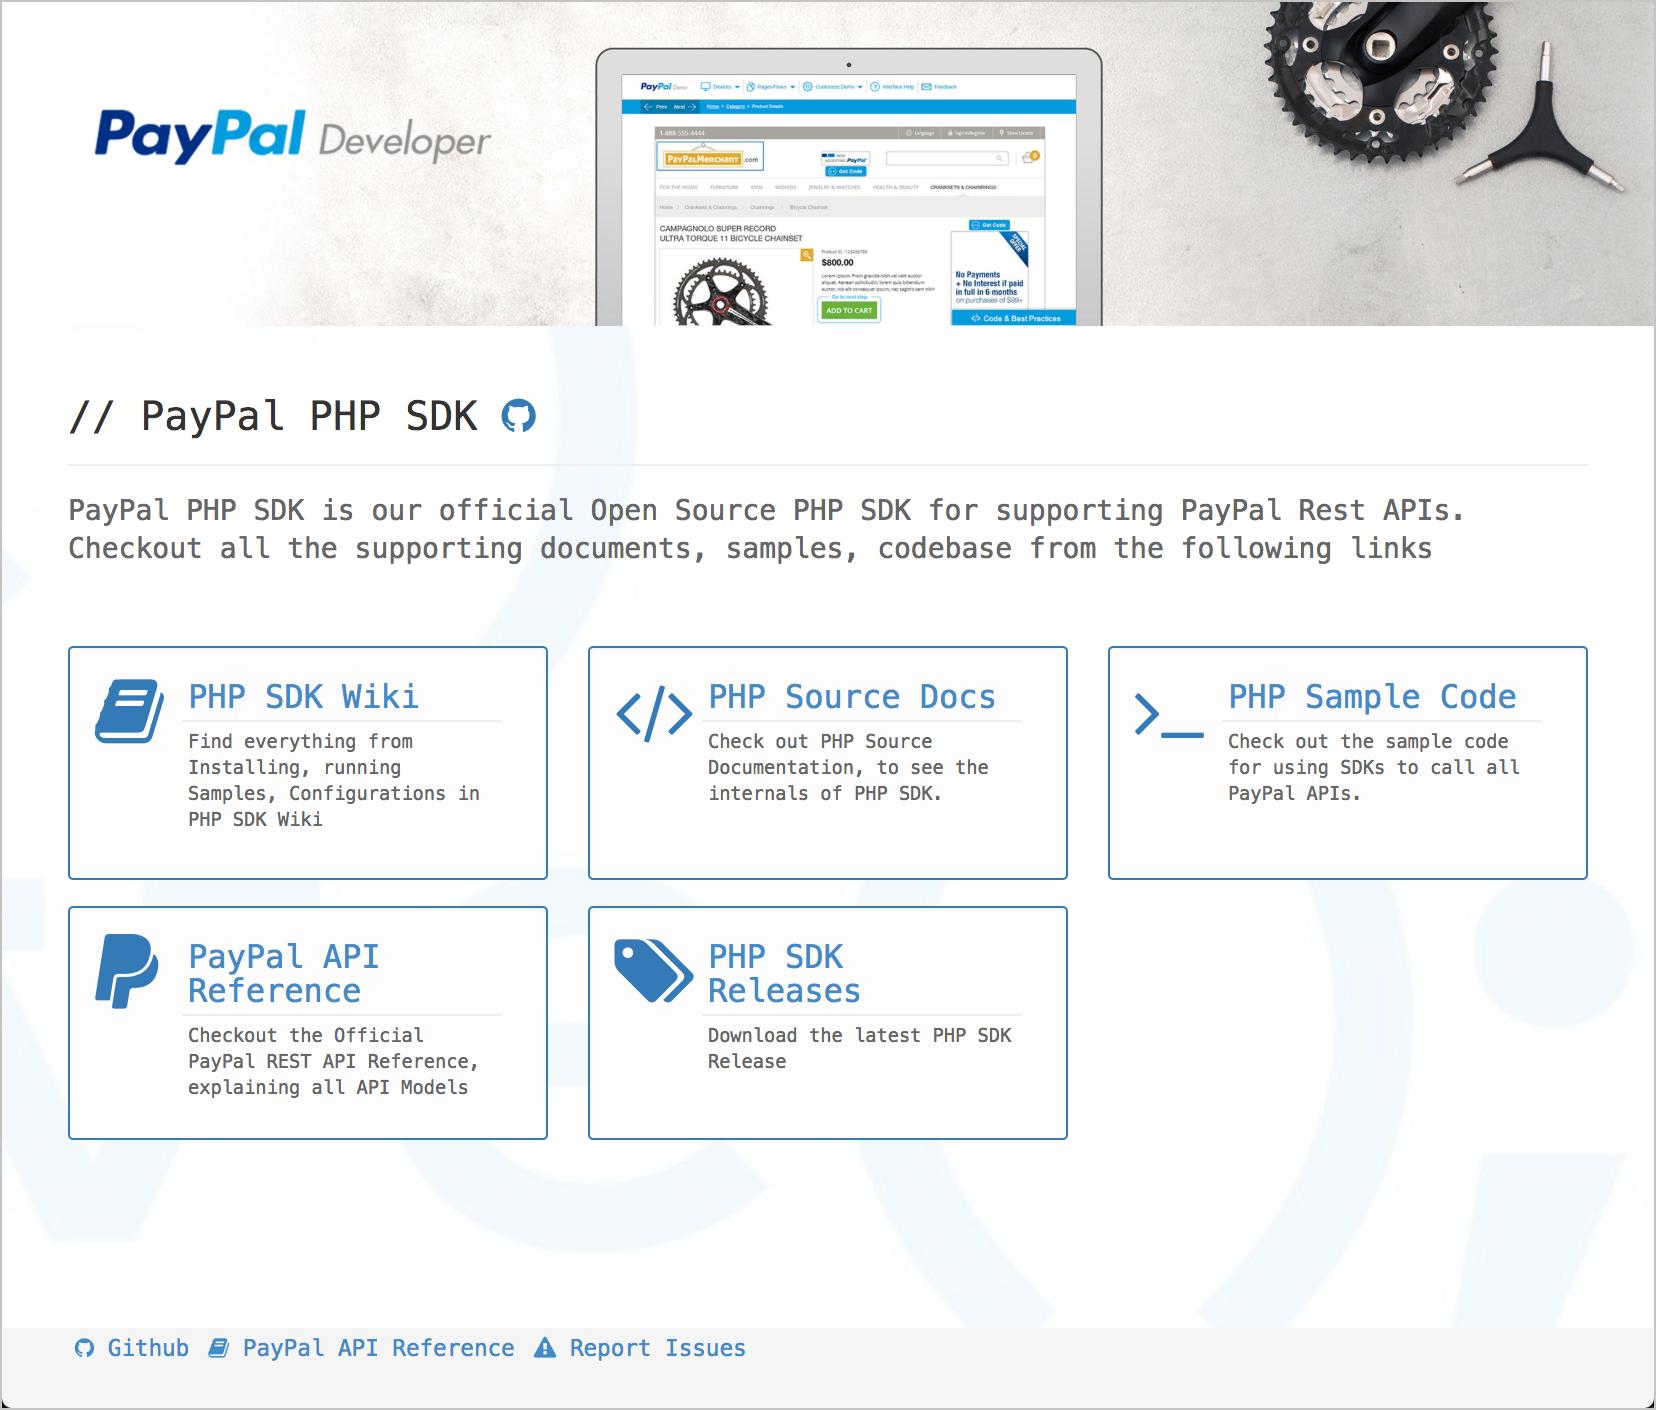 Paypal PHP SDK